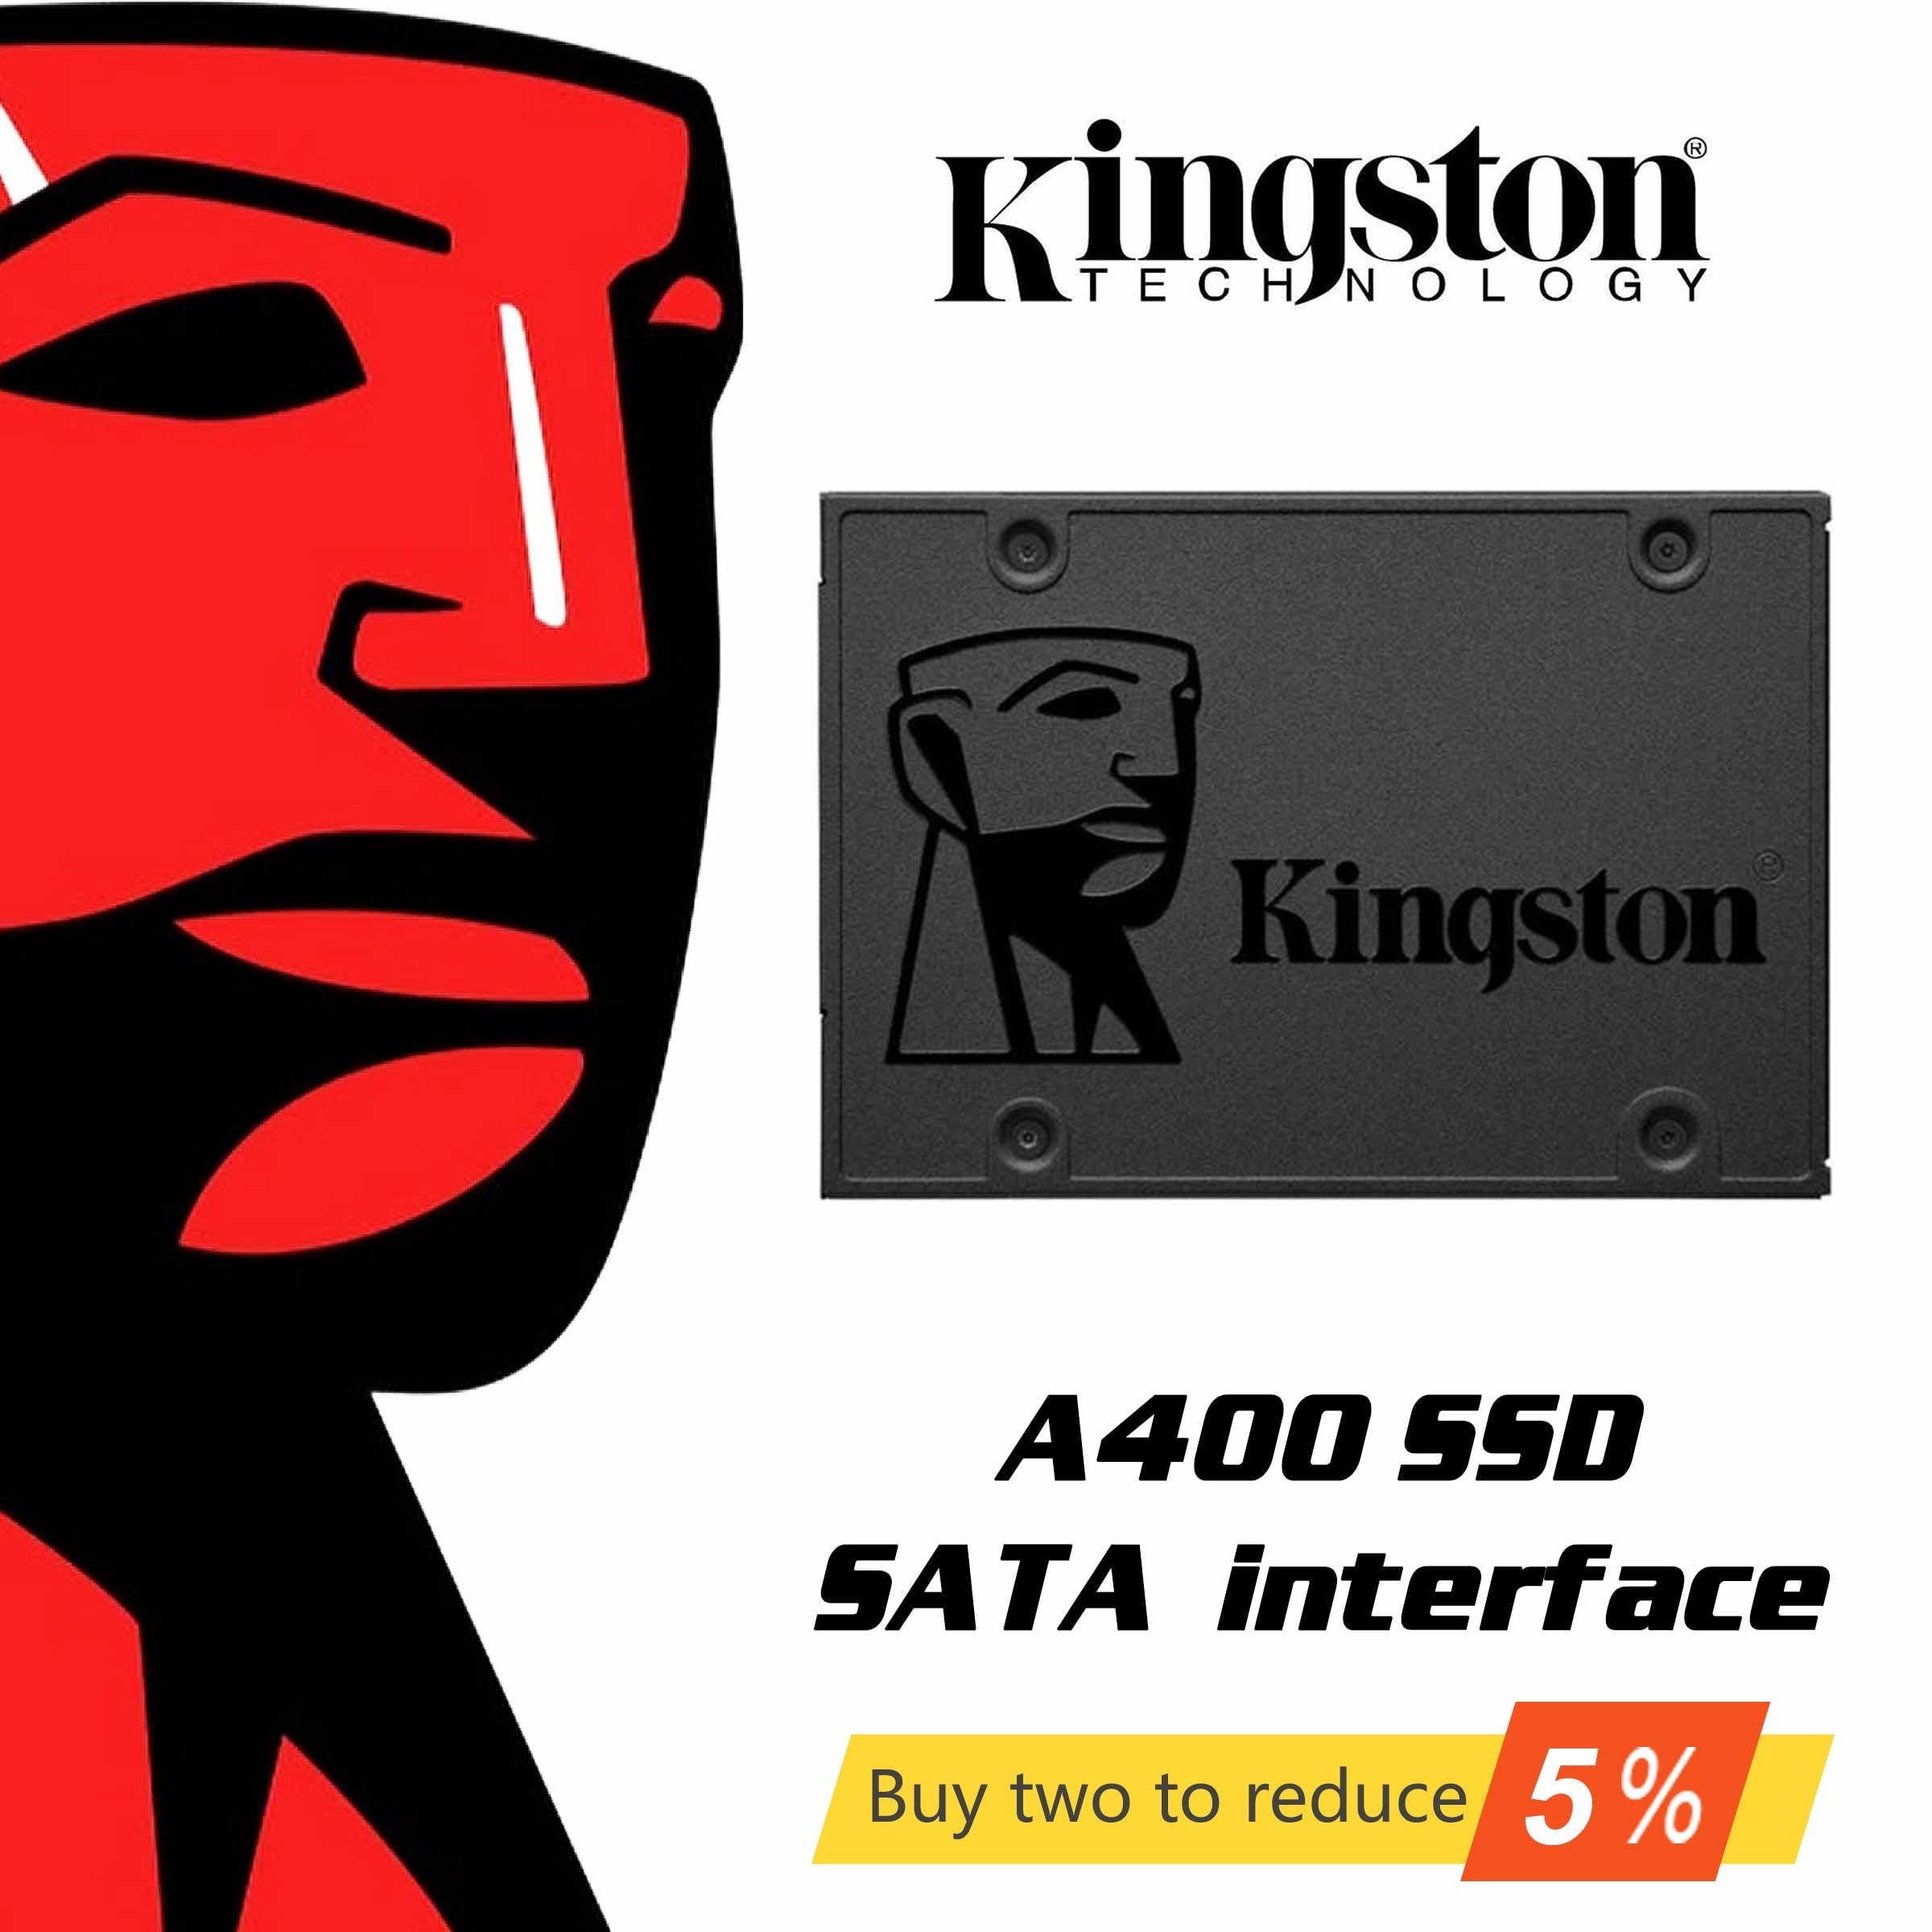 Оригинальный Kingston A400 SSD SATA3 2,5 дюйма 240 ГБ 480 ГБ Внутренний твердотельный накопитель HDD жесткий диск SSD для ПК ноутбука компьютера|kingston ssd|ssd for pcdisk ssd | АлиЭкспресс